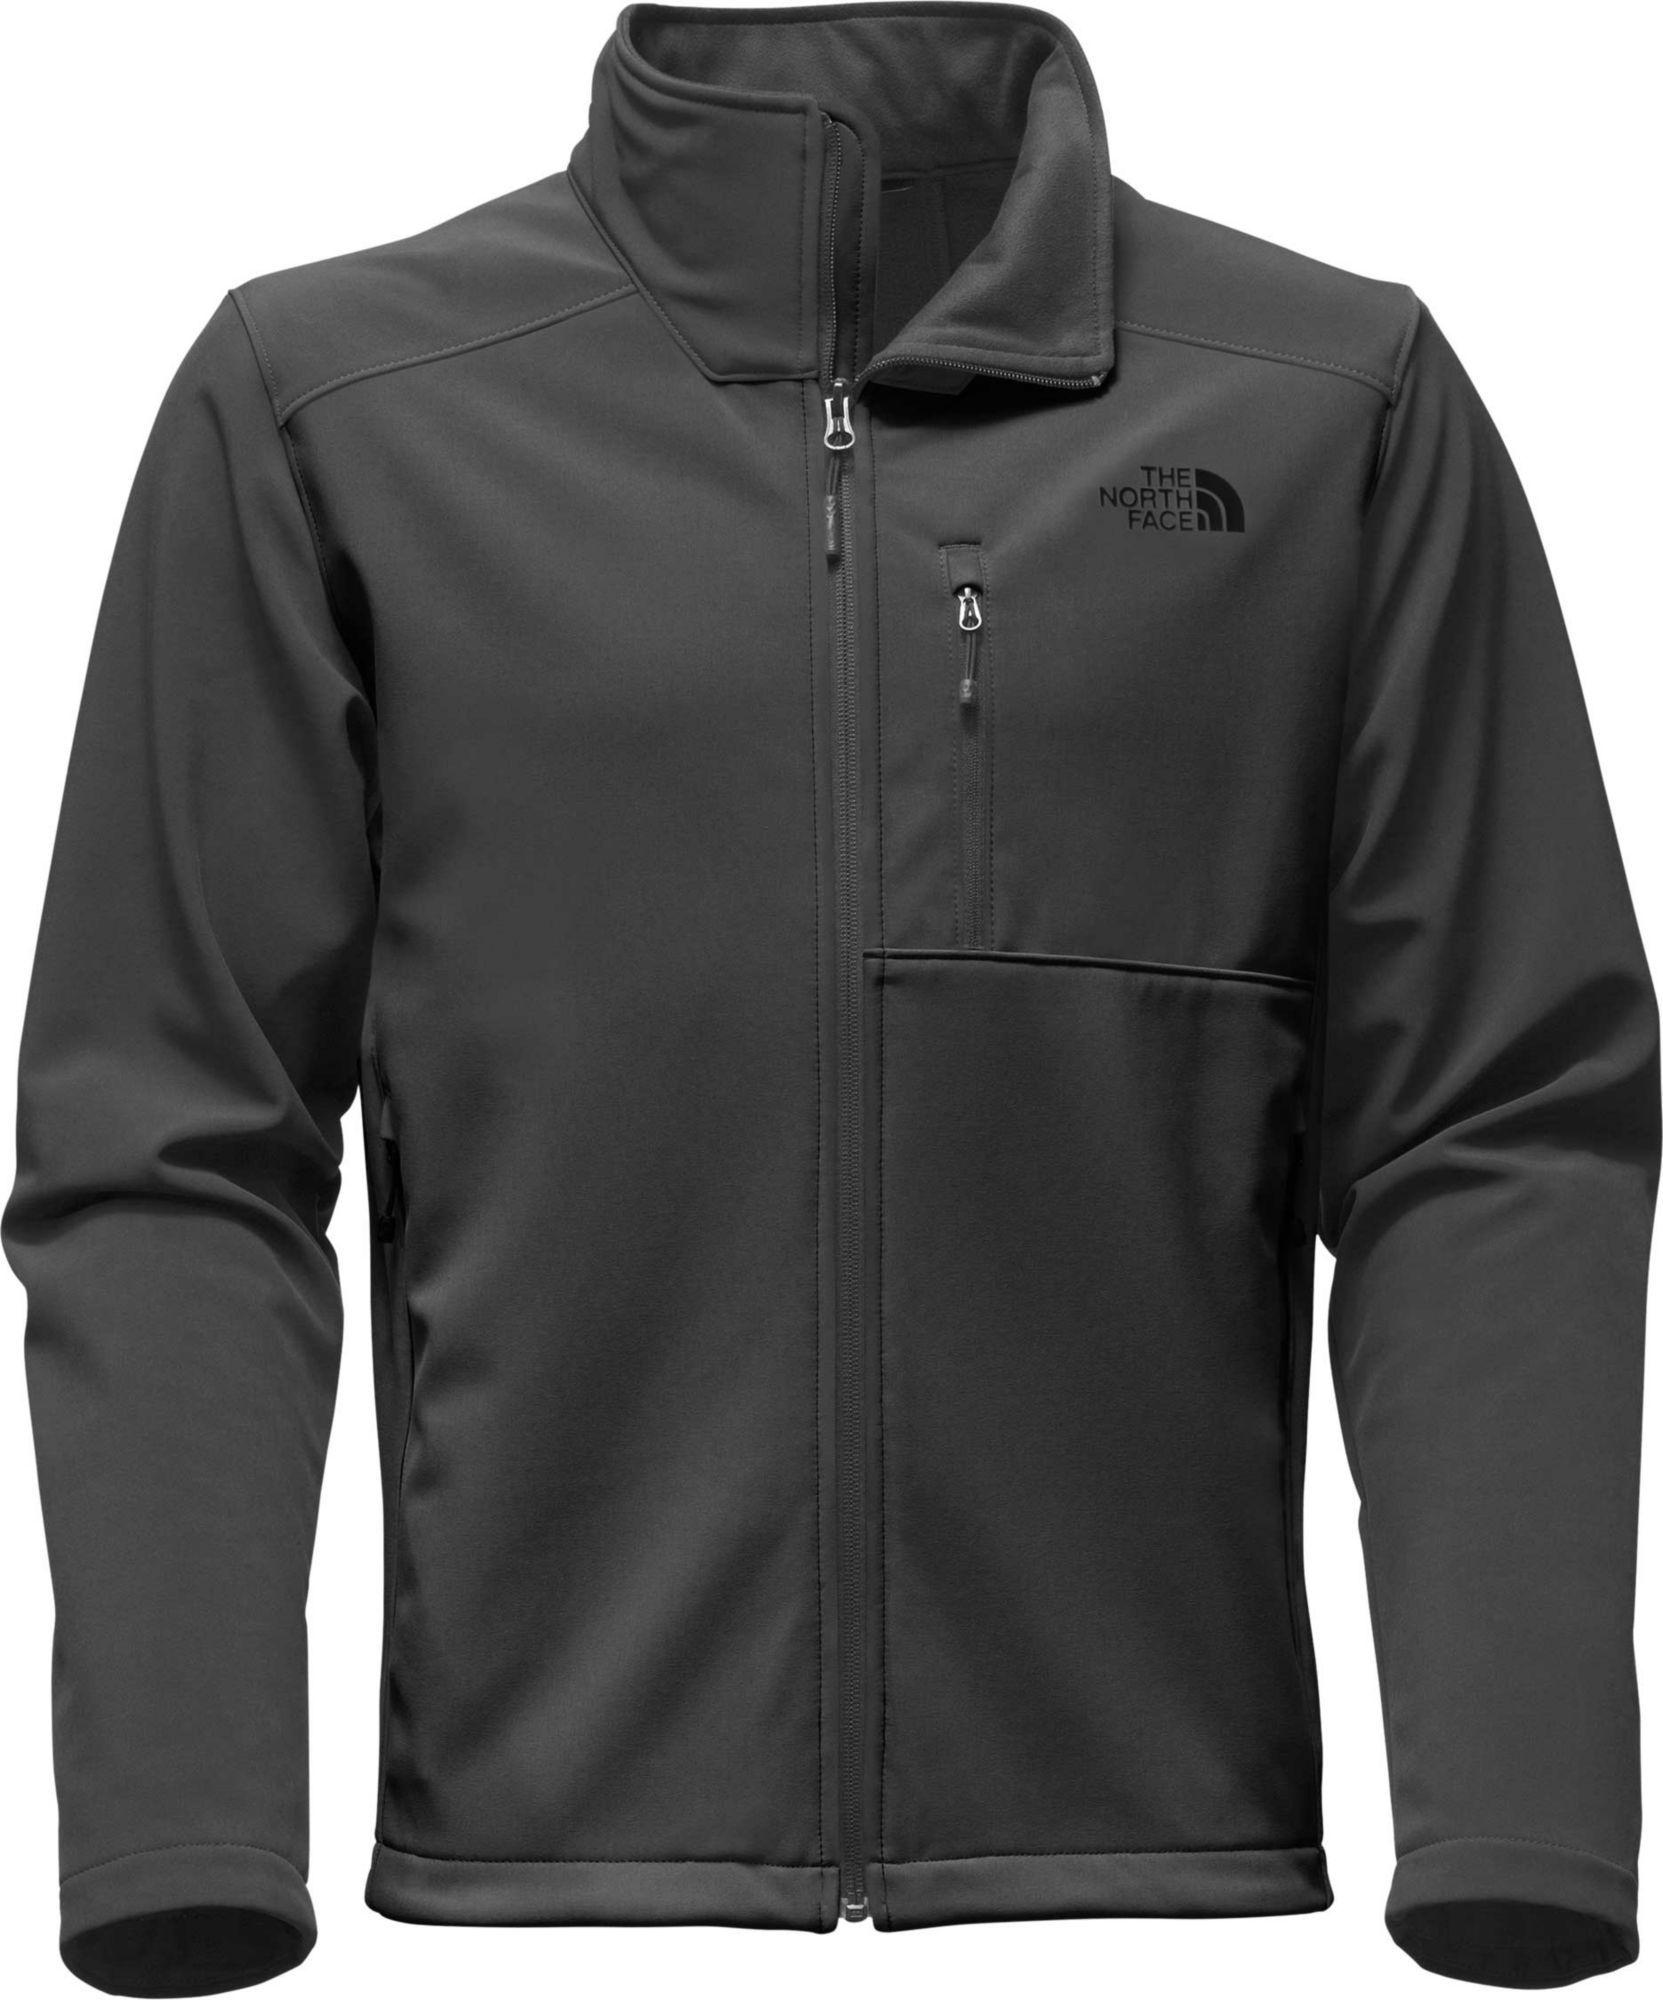 The North Face Men/'s Big /& Tall Apex Risor Jacket